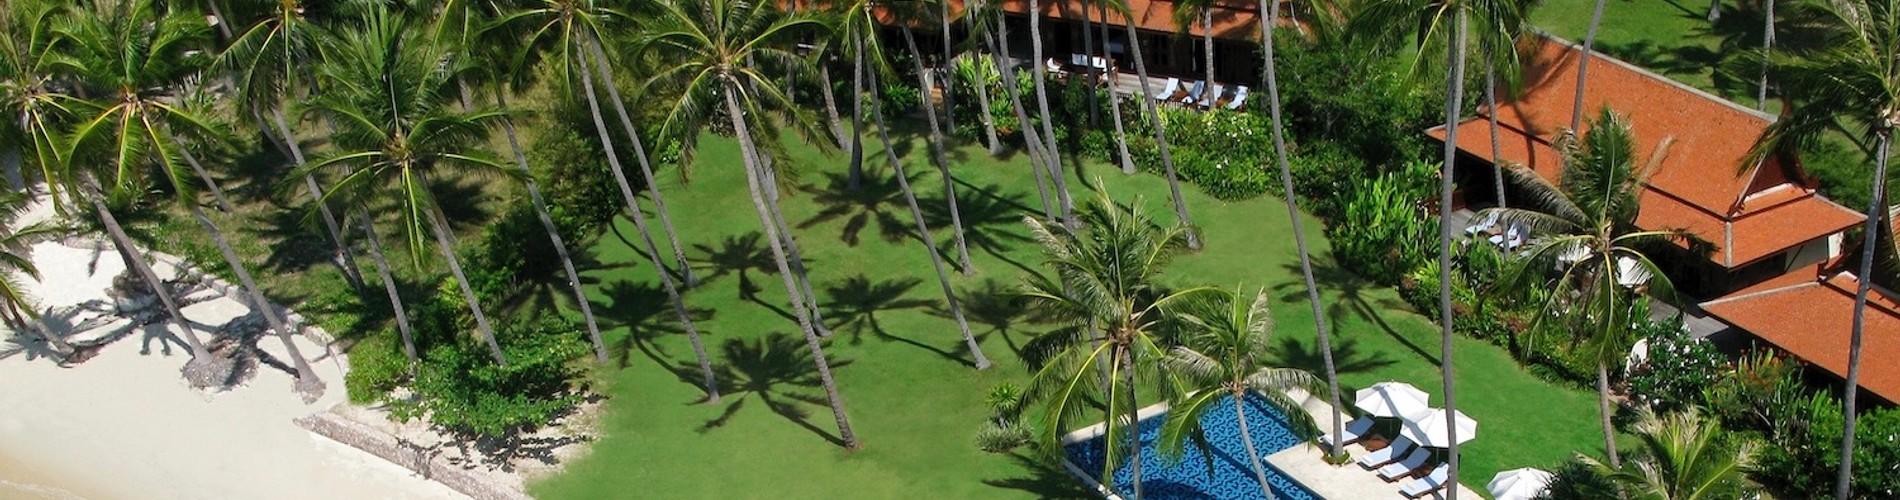 Vacation Rental Ban Sairee - Beach Villa in Laem Sor